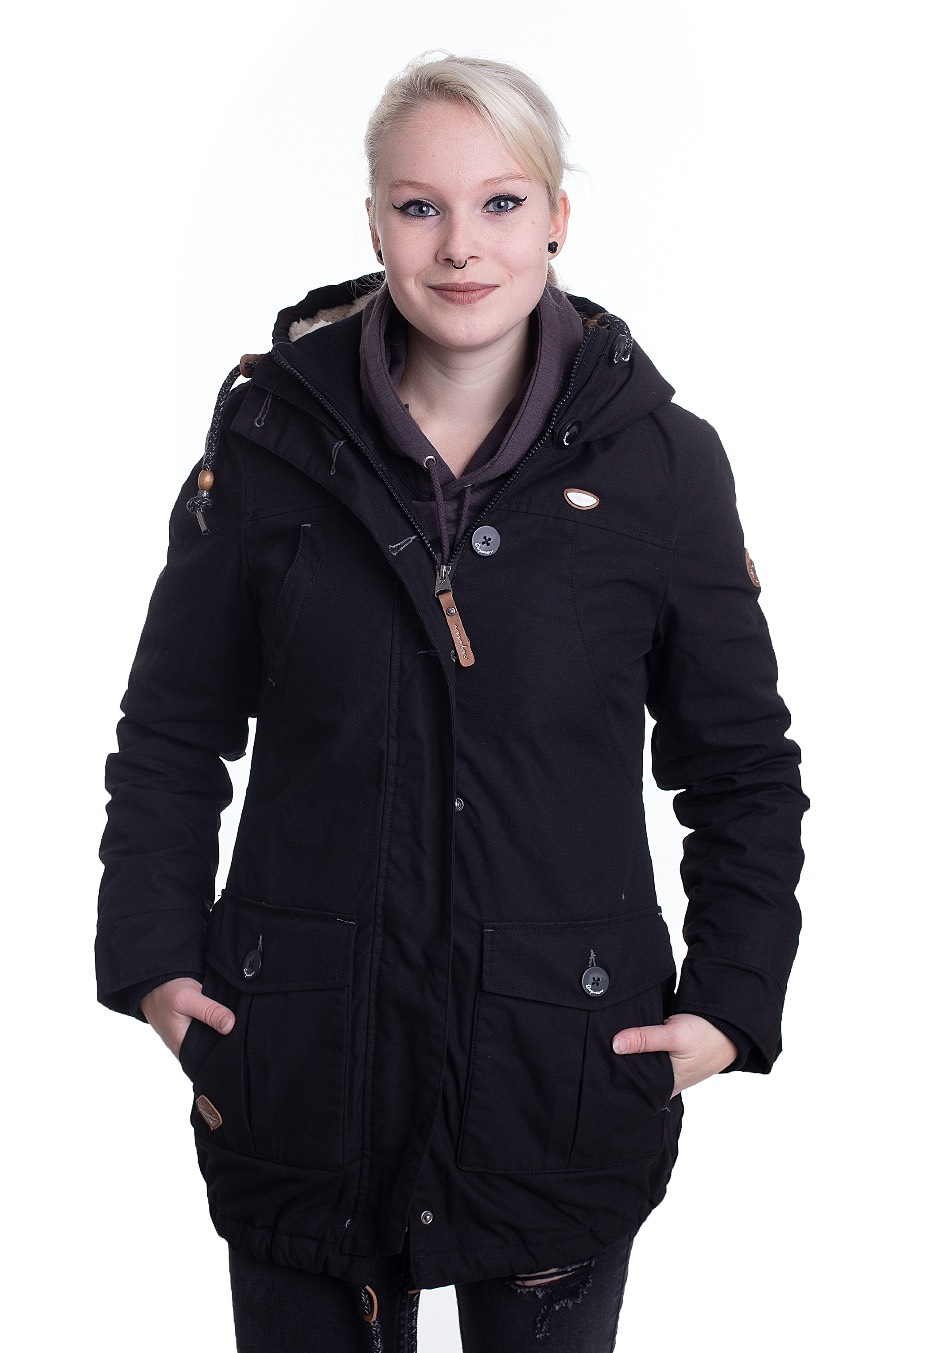 Jacken - Ragwear Jane Black Jacken  - Onlineshop IMPERICON